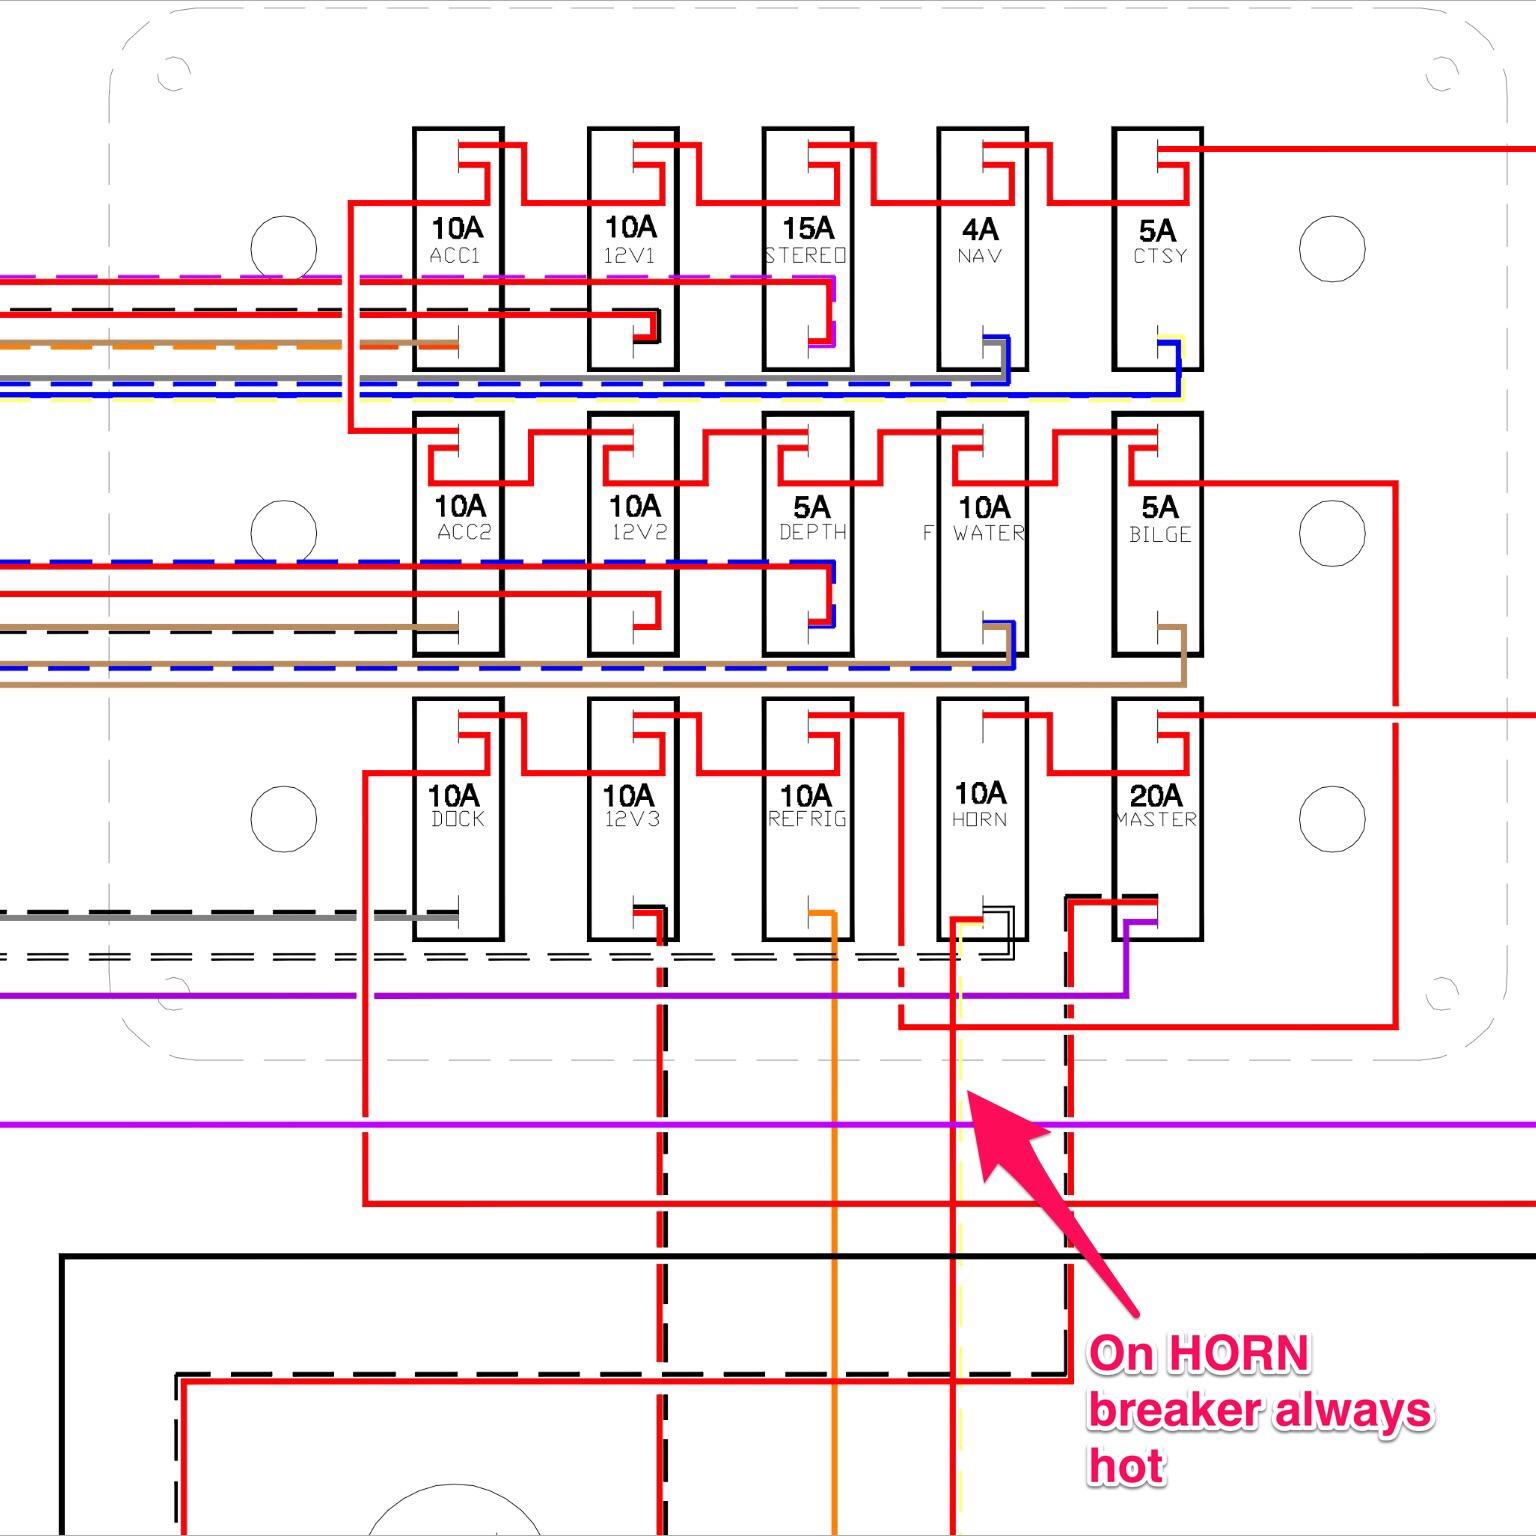 nsdycn1woofn?resize\\\\\\\=665%2C665\\\\\\\&ssl\\\\\\\=1 wiring diagram kenwood kdc 610u color wiring diagram images kenwood kdc-610u wiring harness at readyjetset.co